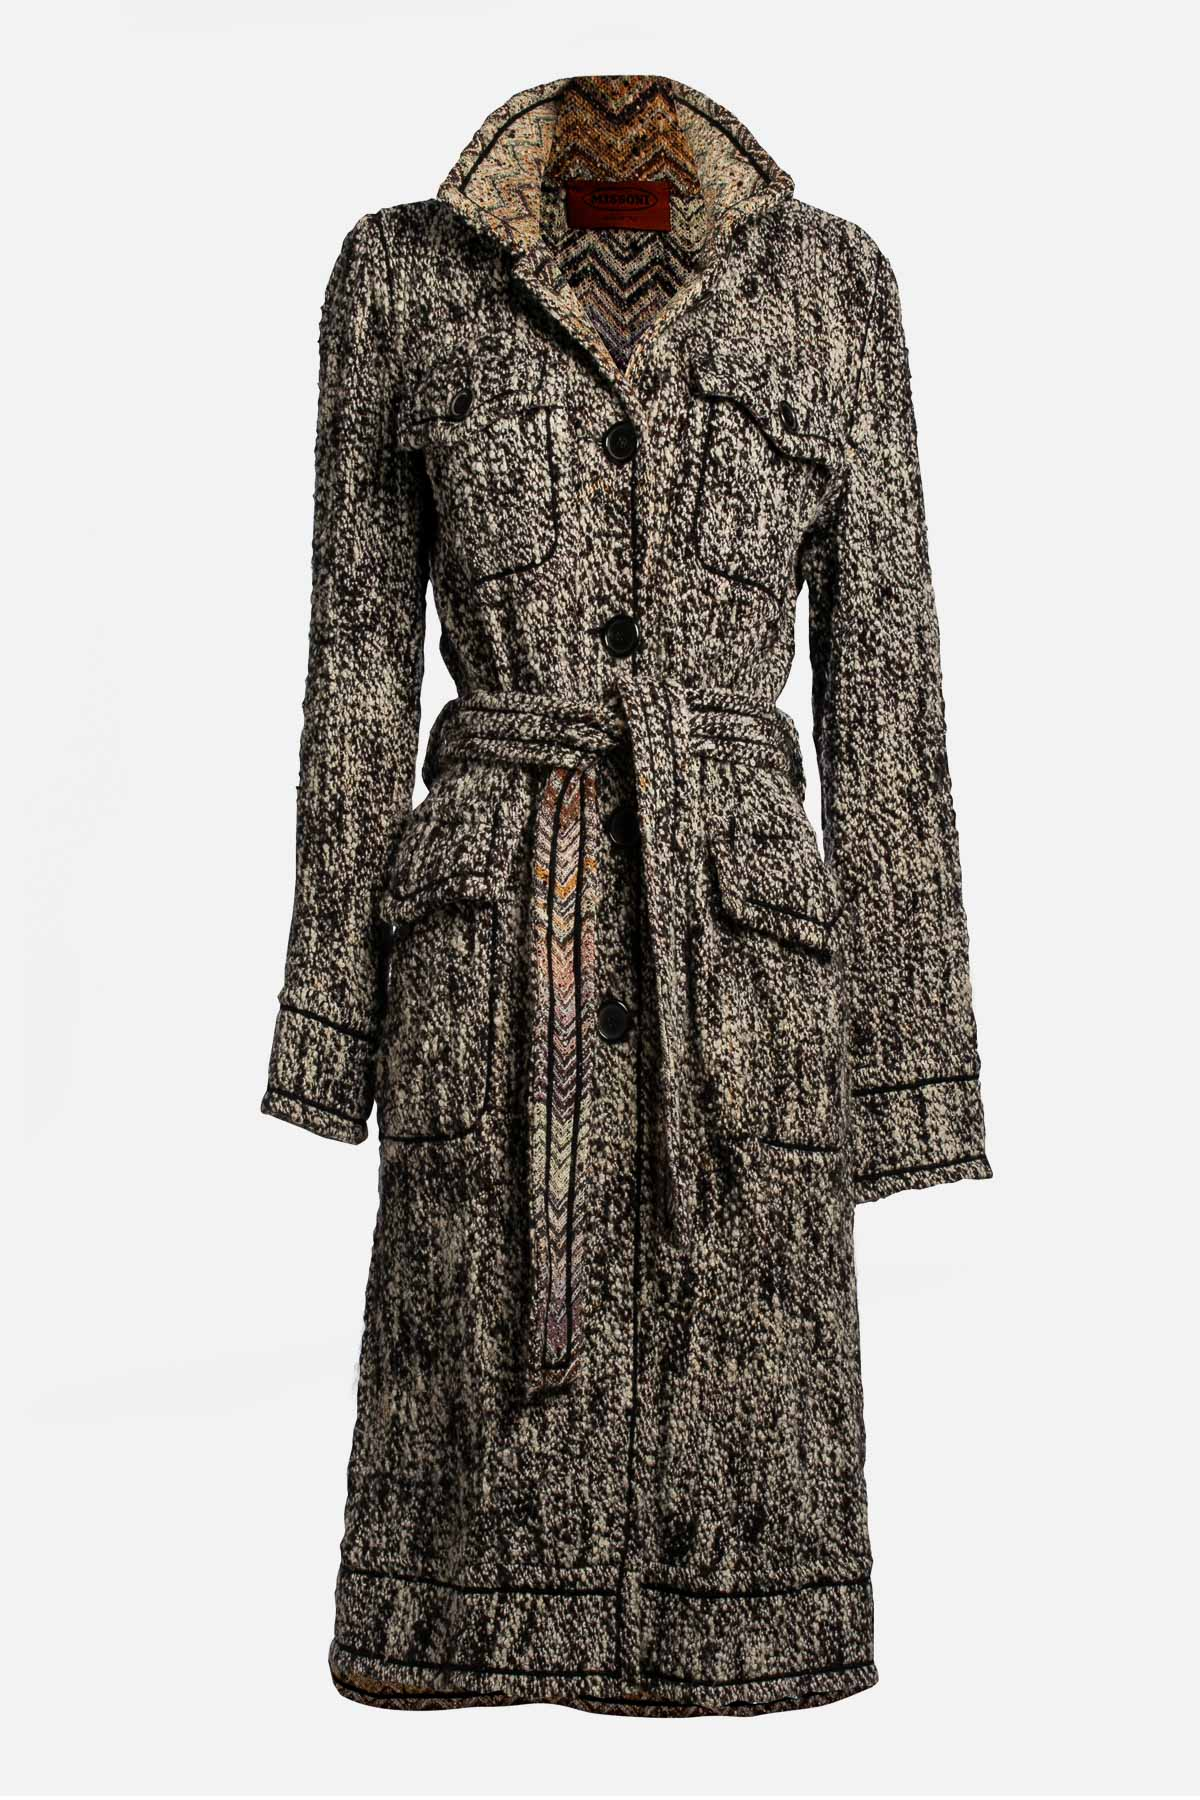 Wool Silk Knit Coat